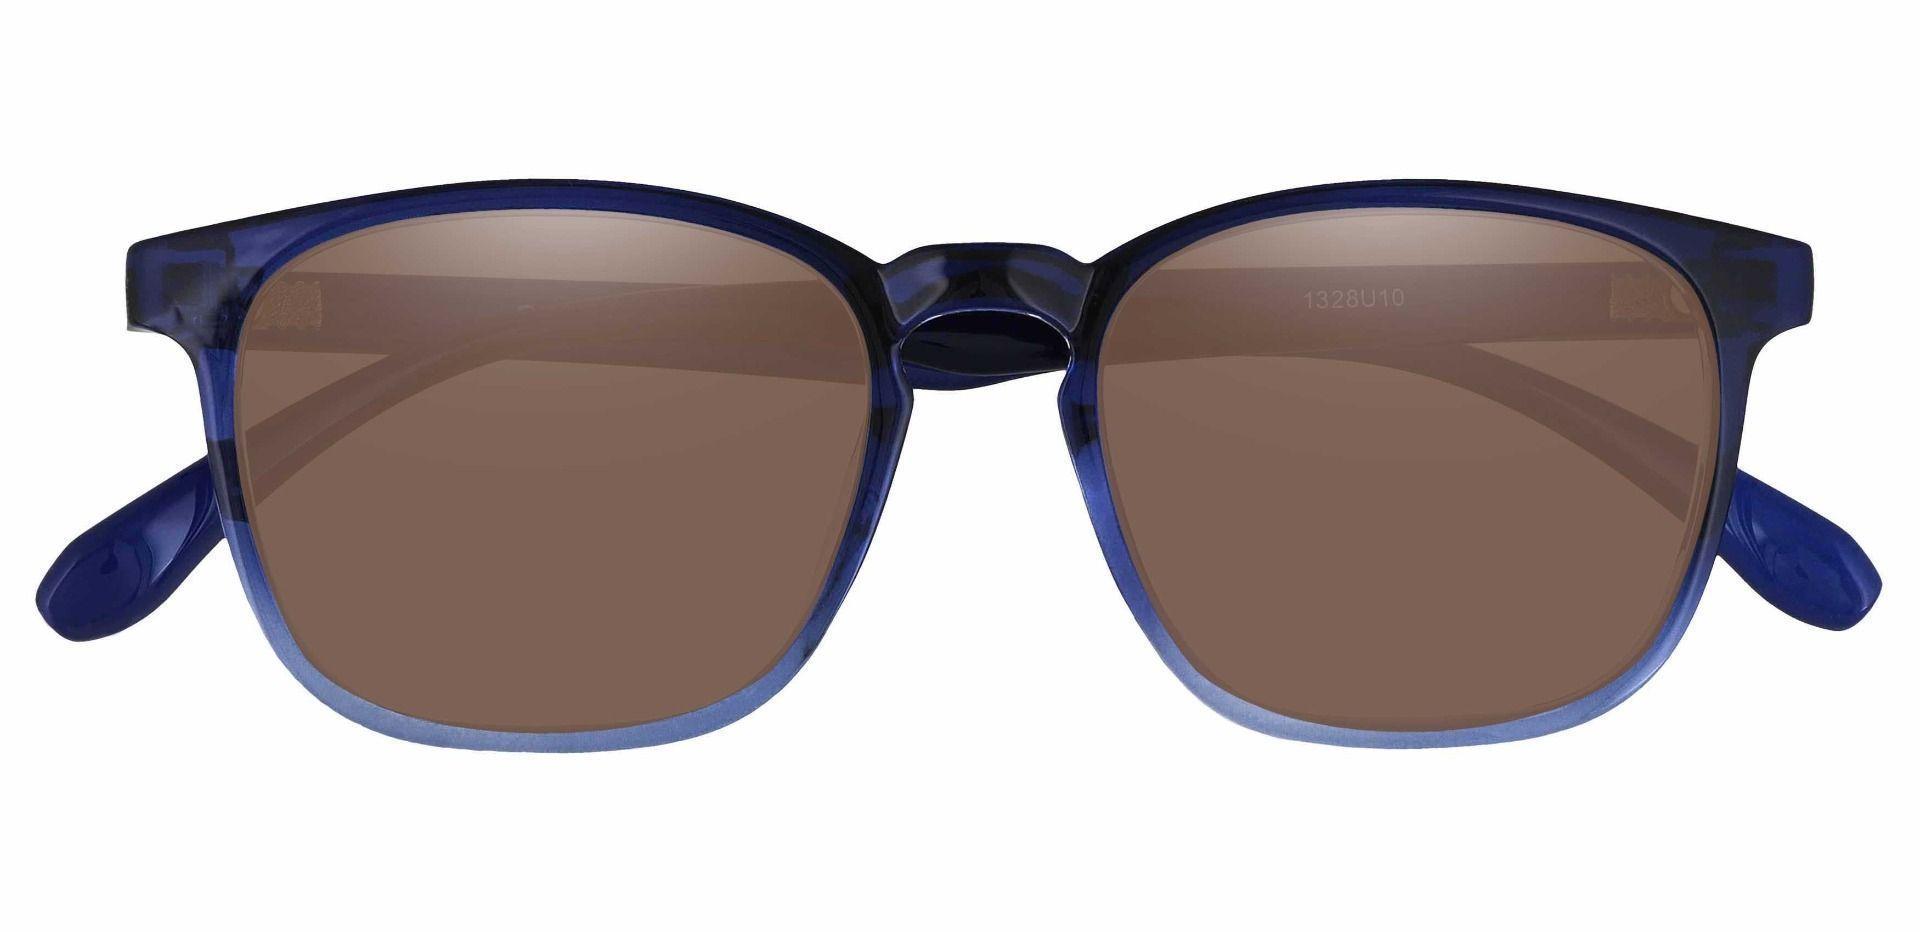 Dusk Classic Square Prescription Sunglasses - Blue Frame With Brown Lenses